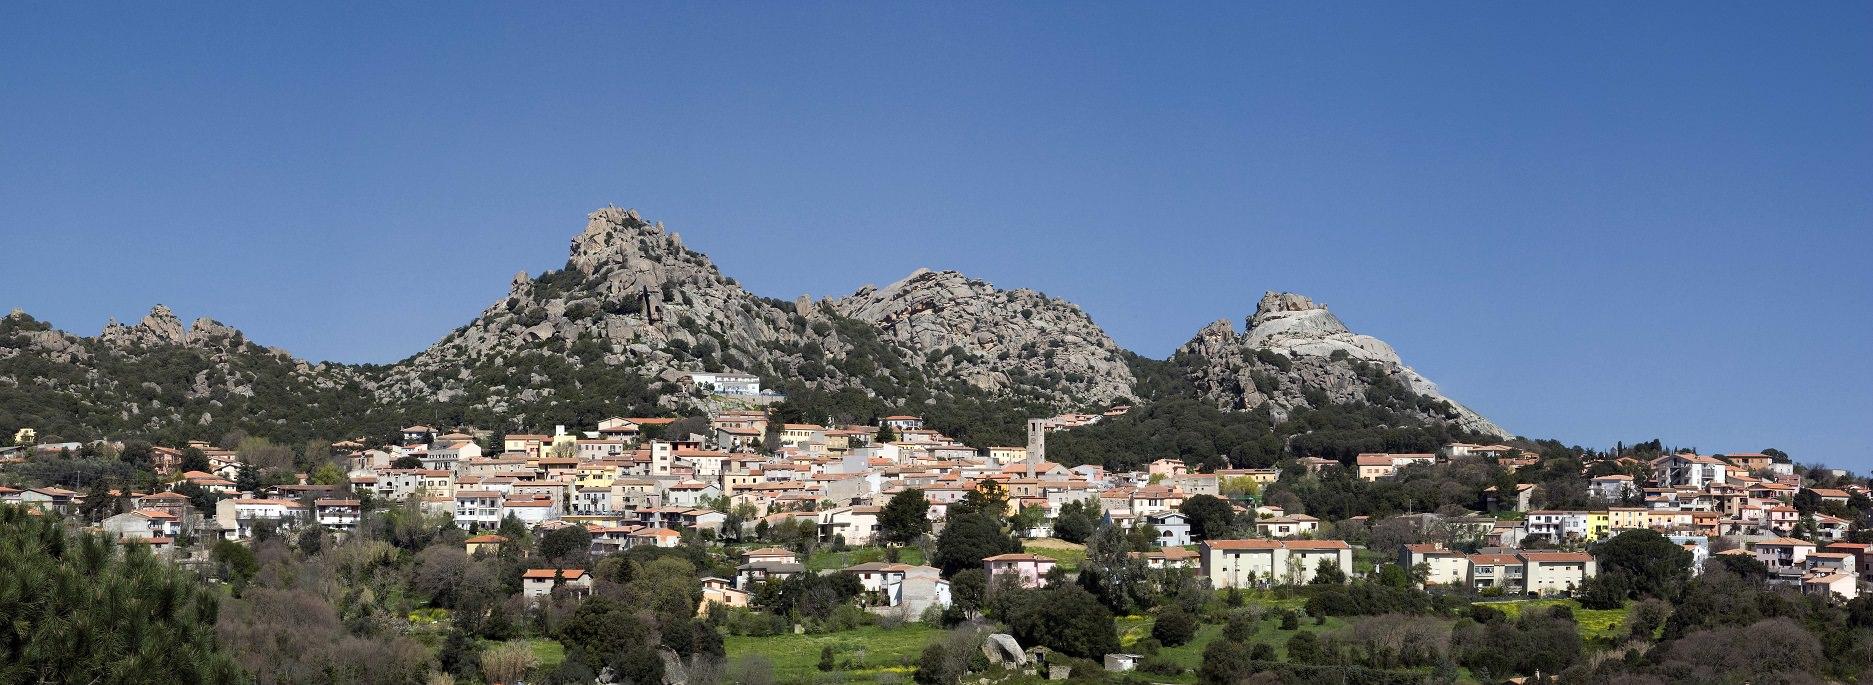 foto panoramica di Aggius, in Gallura, Sardegna